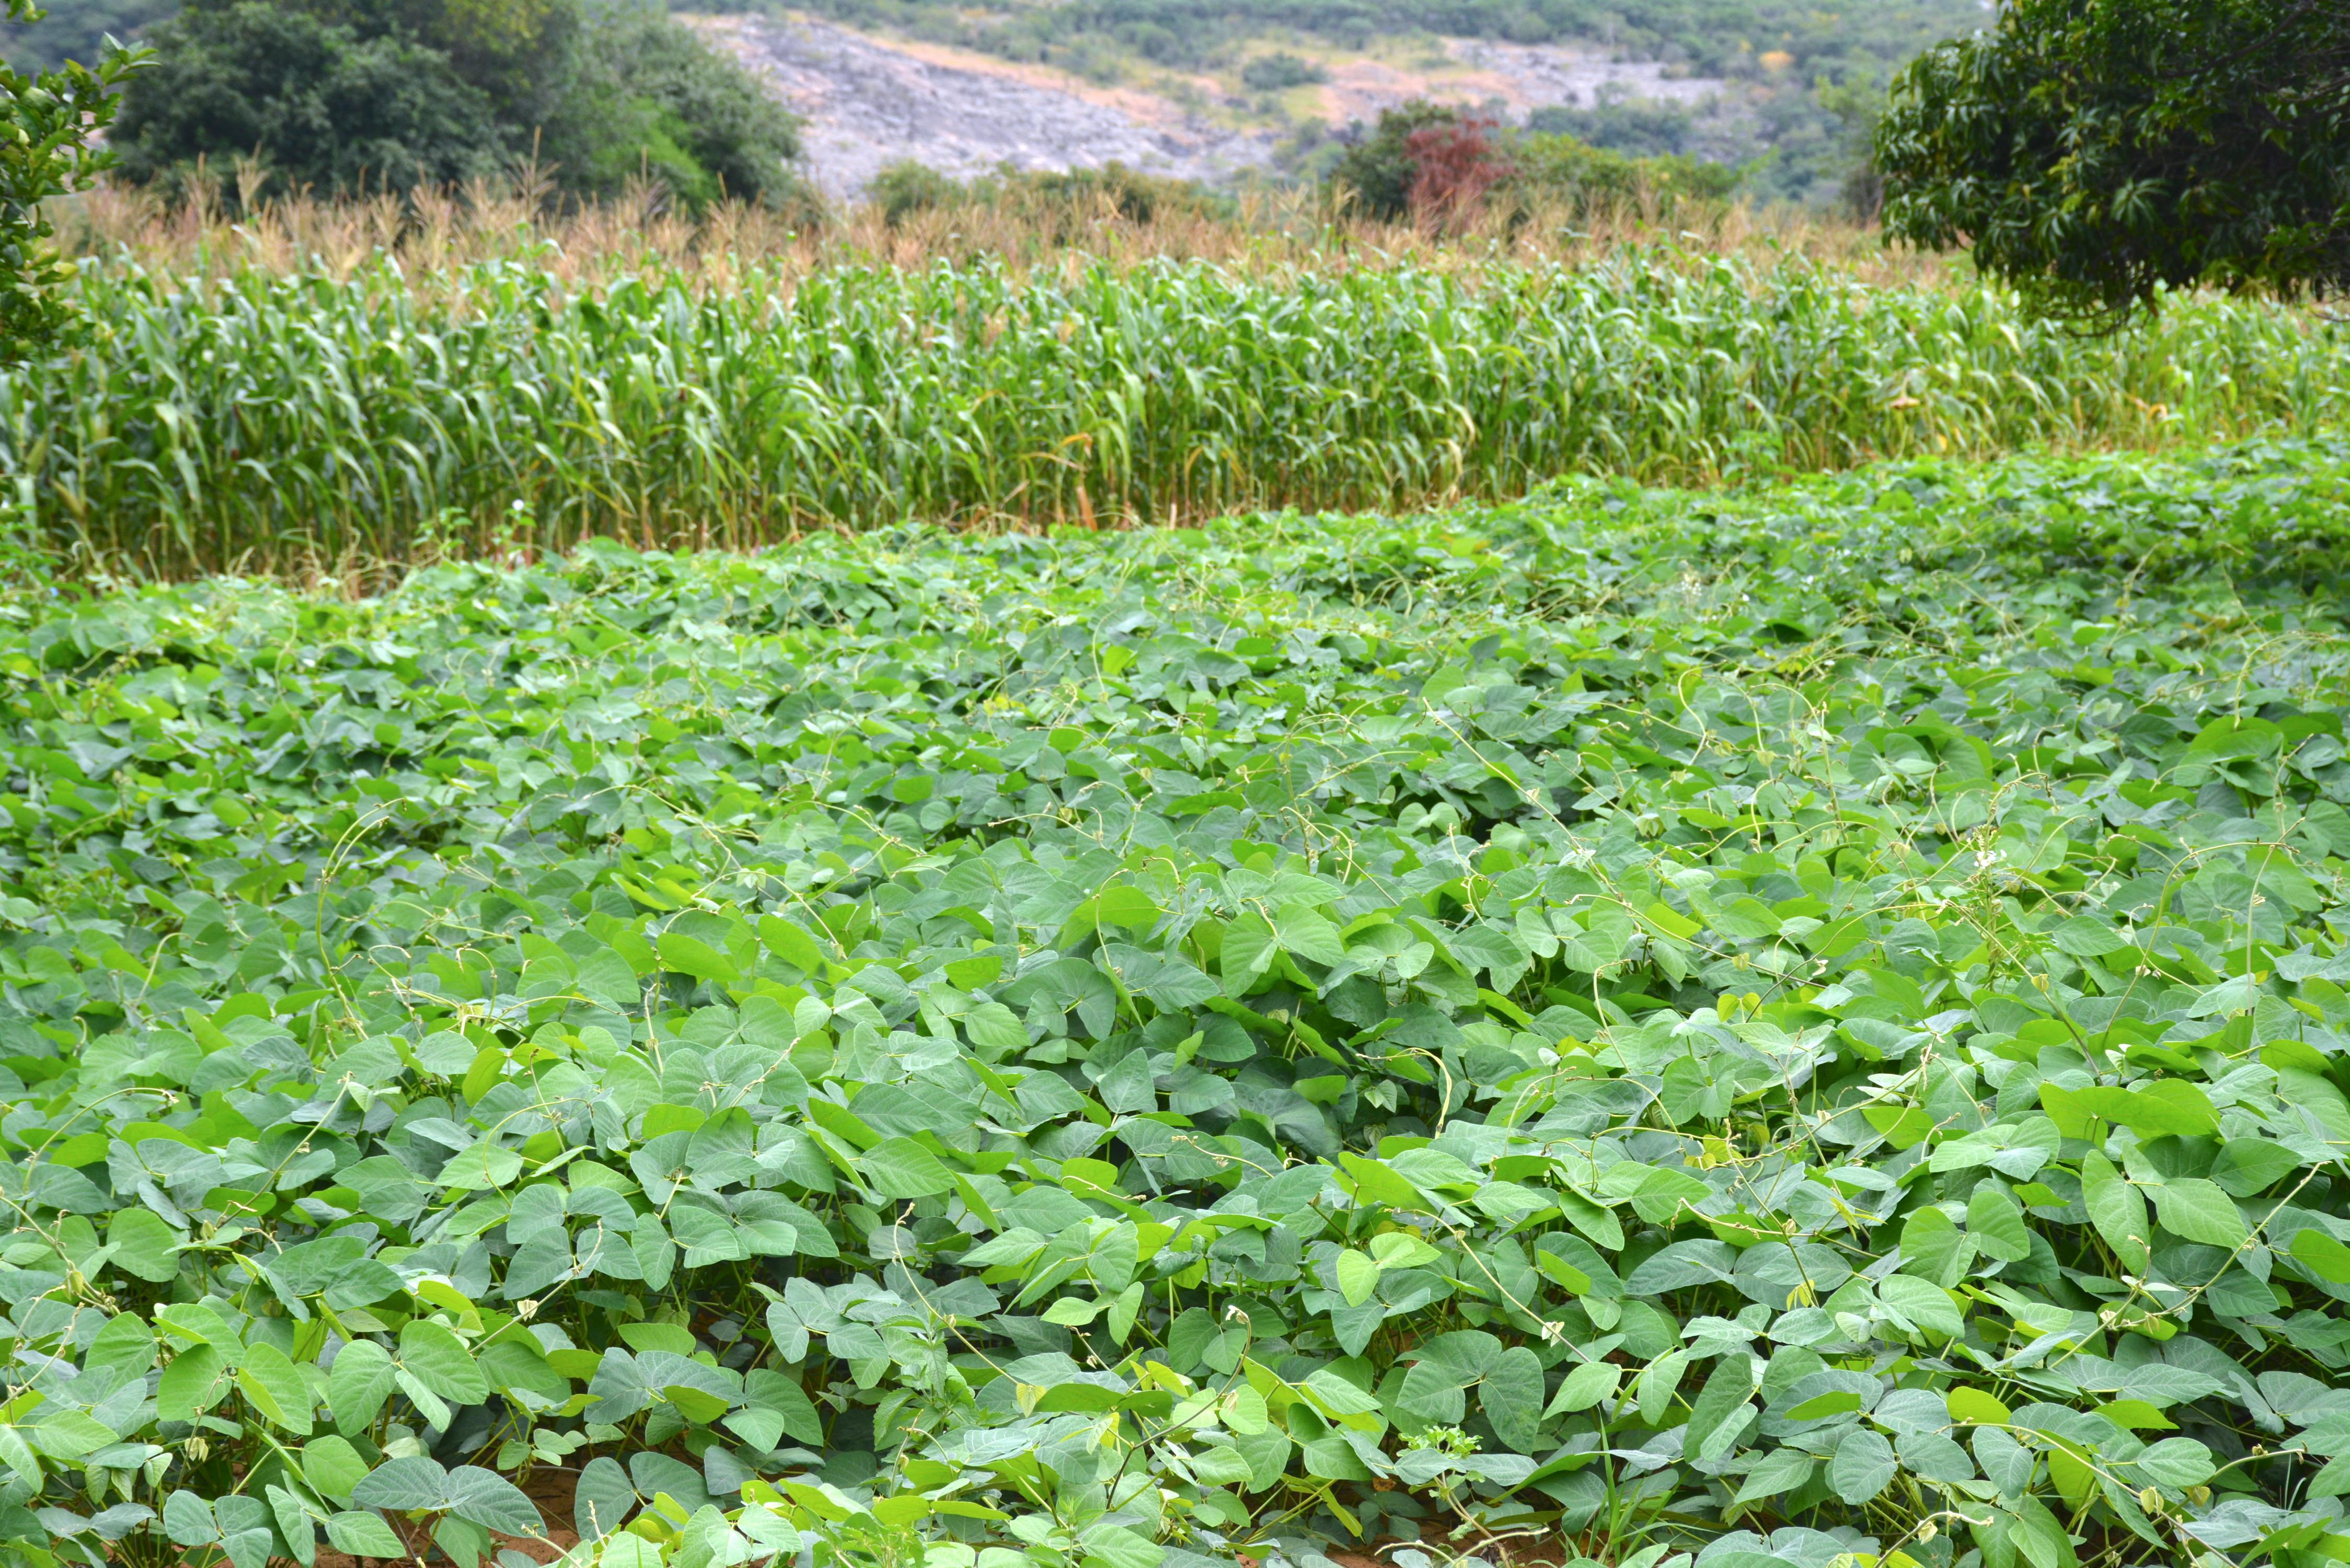 Crop rotation of maize and velvet bean at Kumbirai and Lilian Chiambadzwa's plot has guaranteed high yields in an El Nino season. (Photo: Shiela Chikulo/CIMMYT)